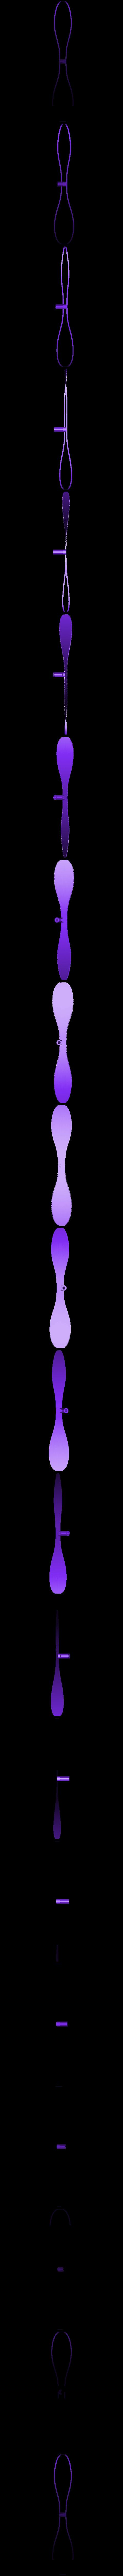 propeller.stl Download STL file drone propeller  • 3D printer model, kasraoui